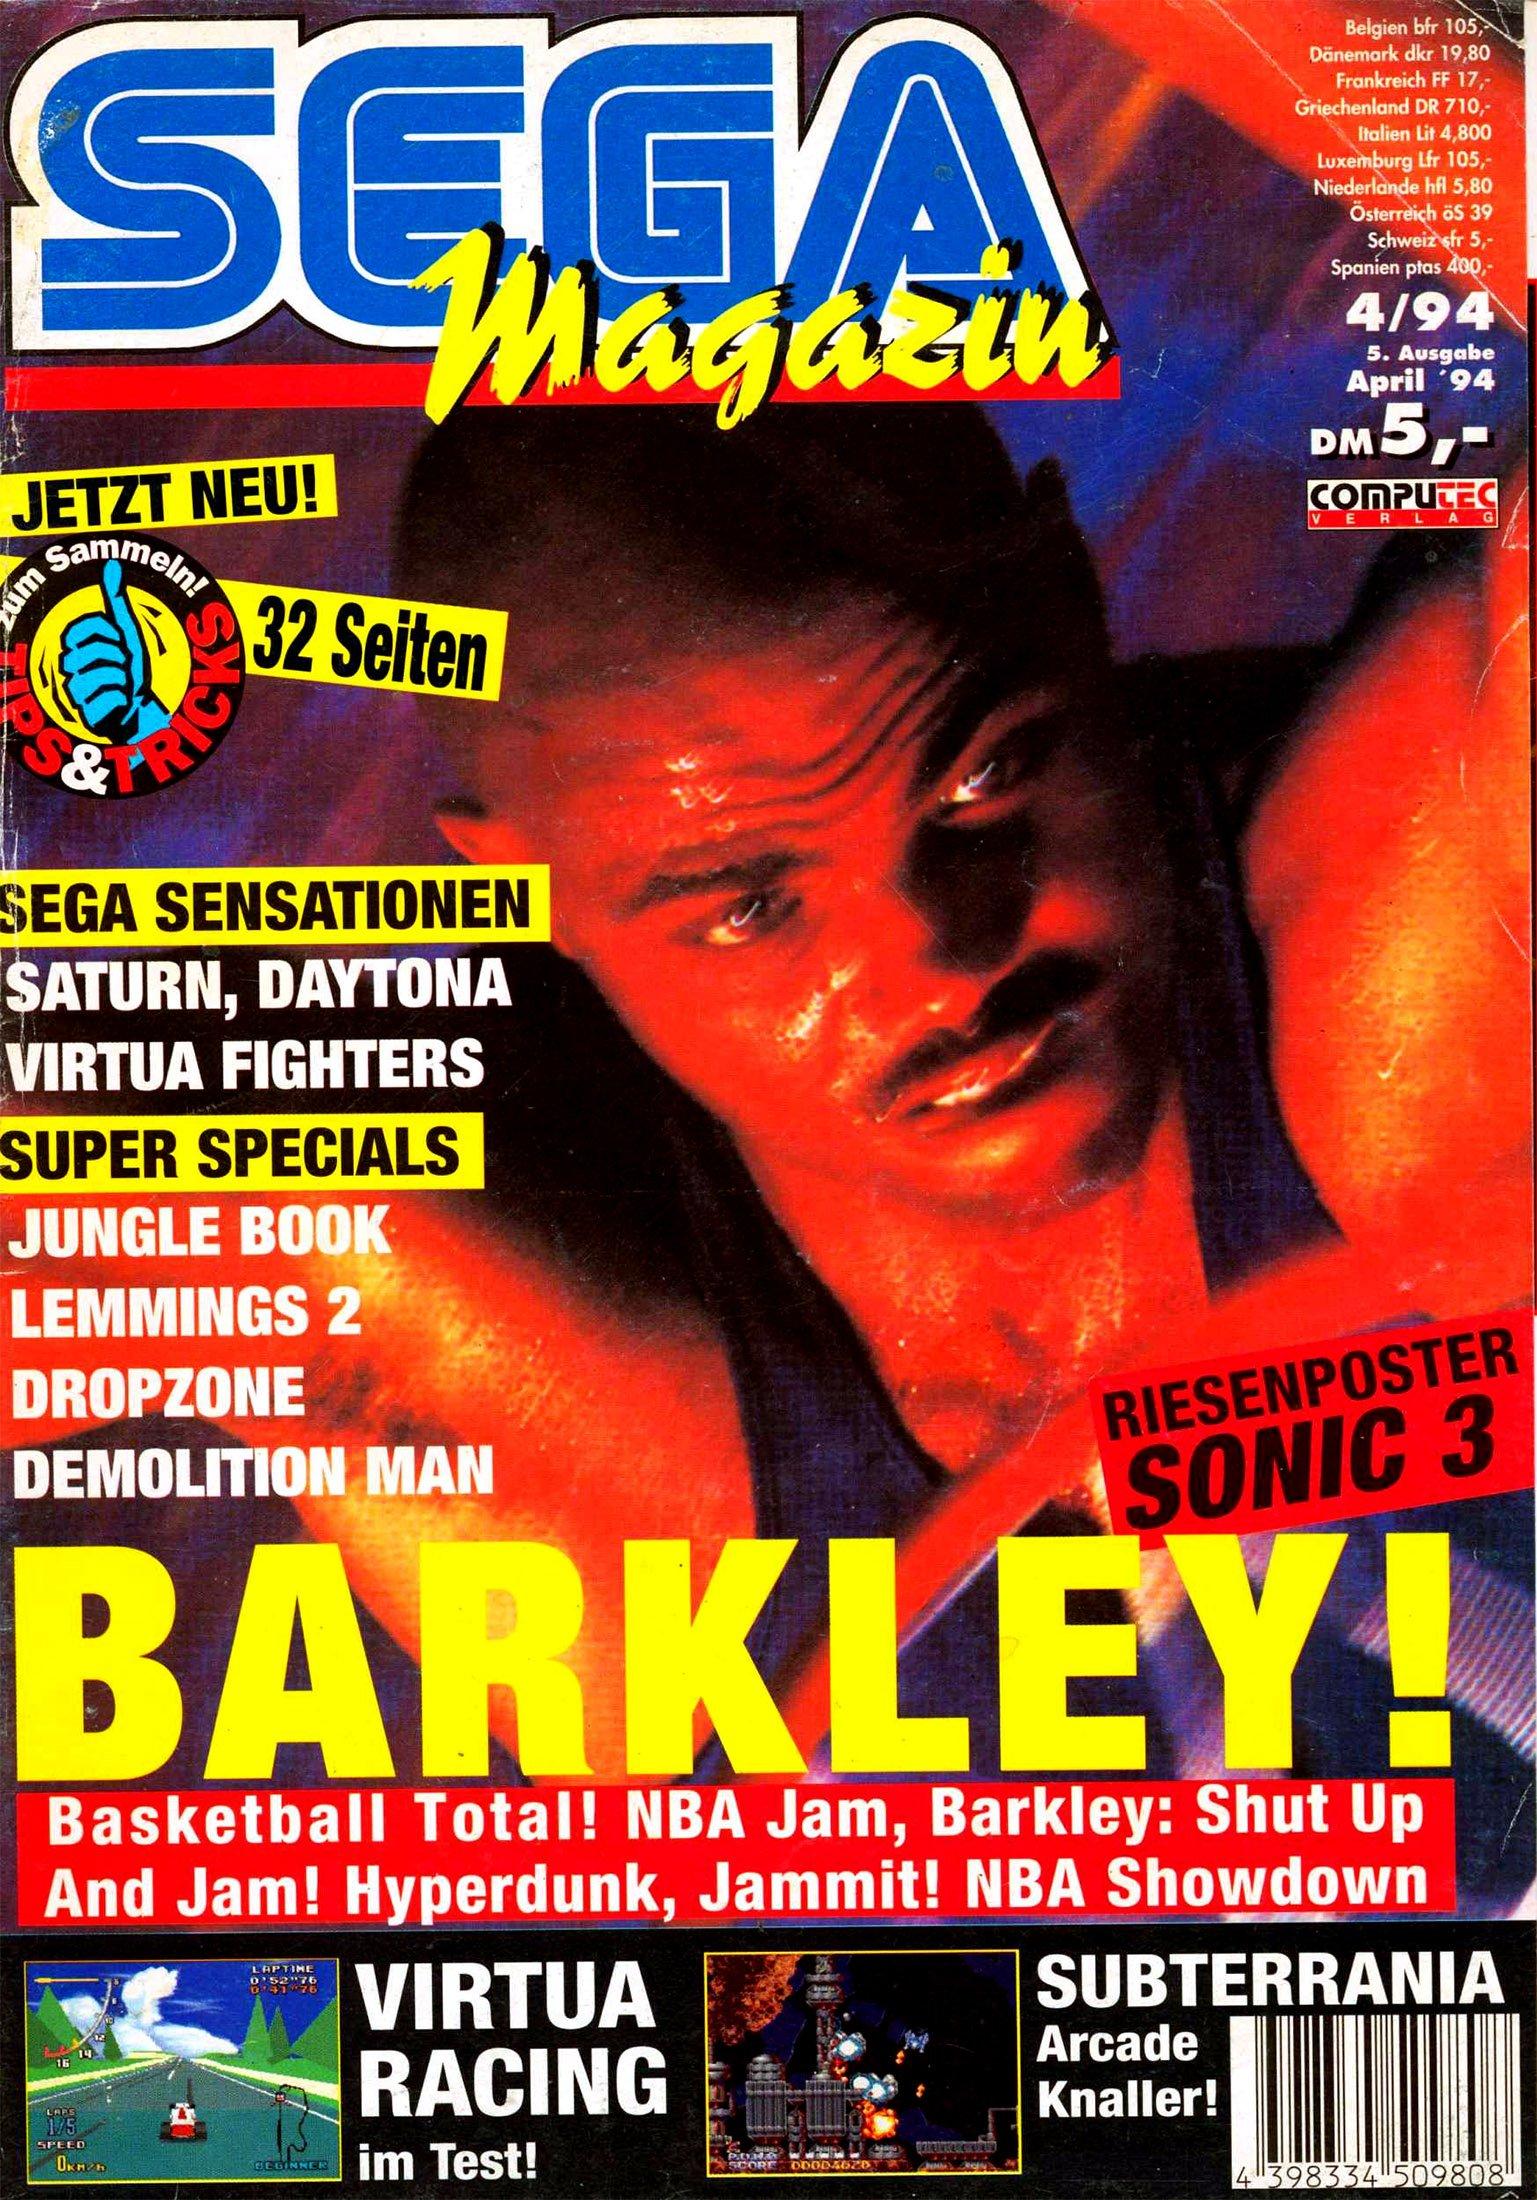 Sega Magazin Issue 05 (April 1994)